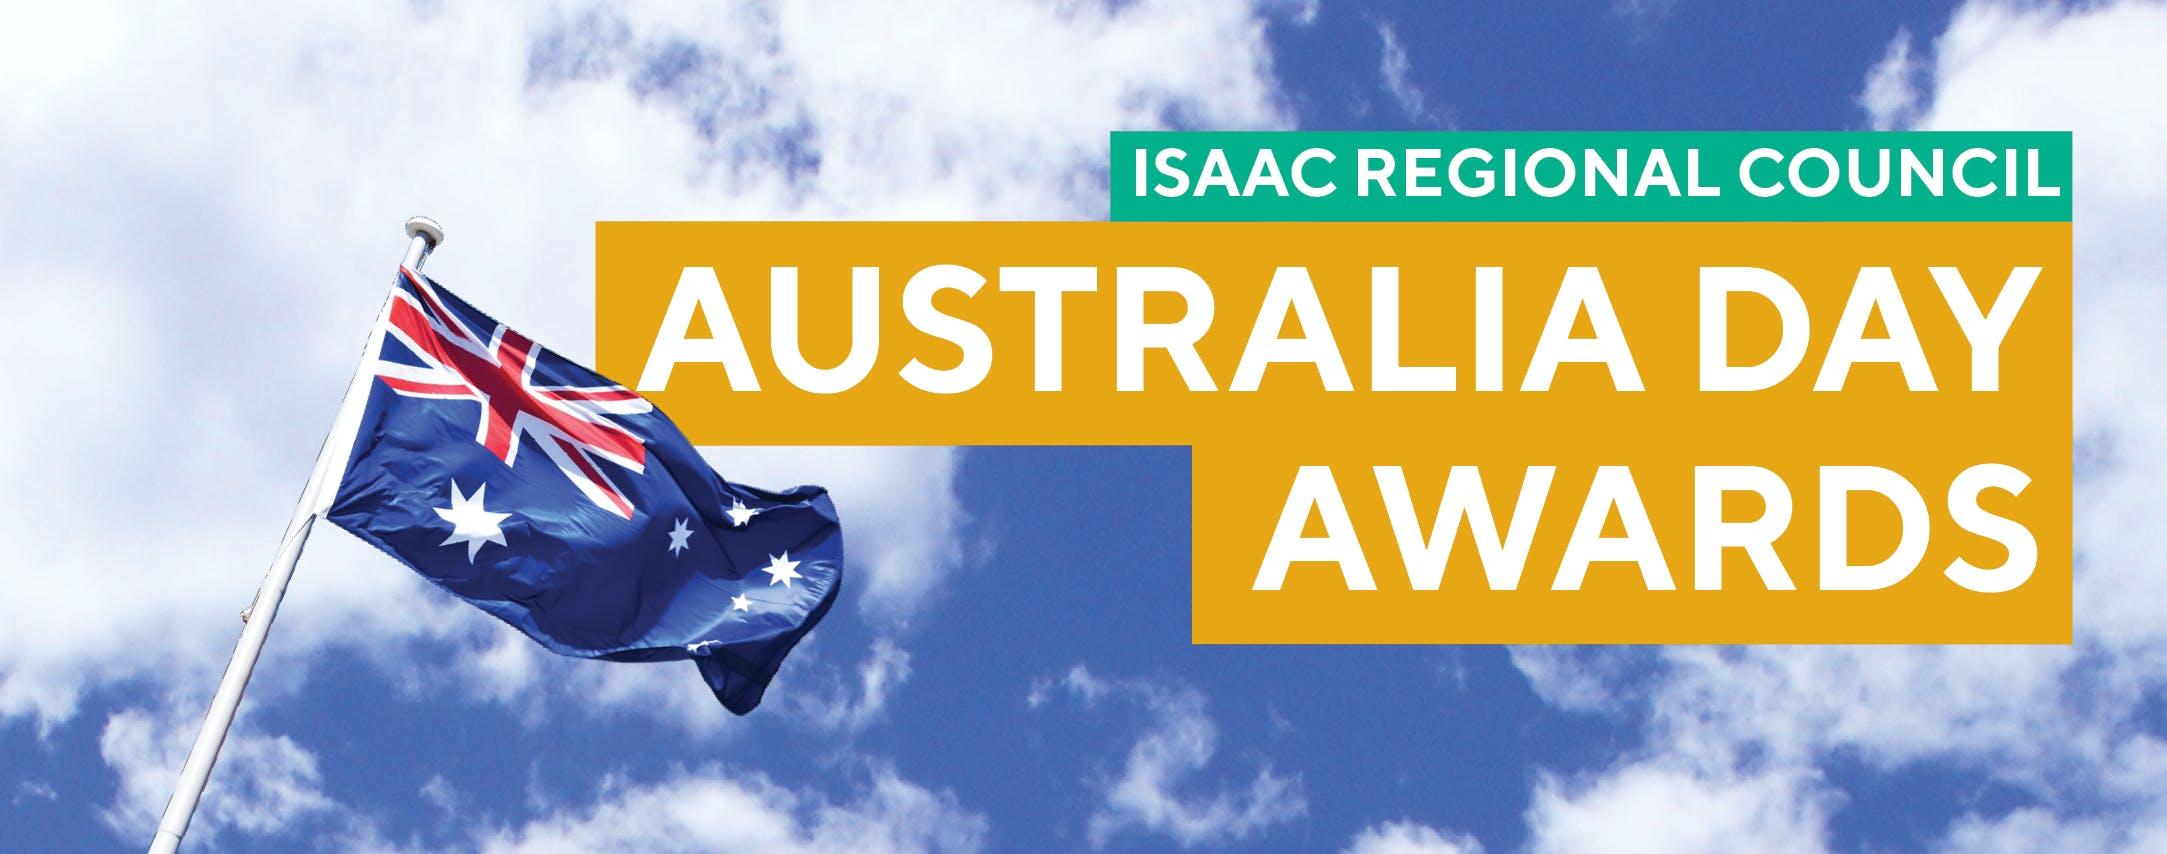 2021 Australia Day Awards Nomination Process